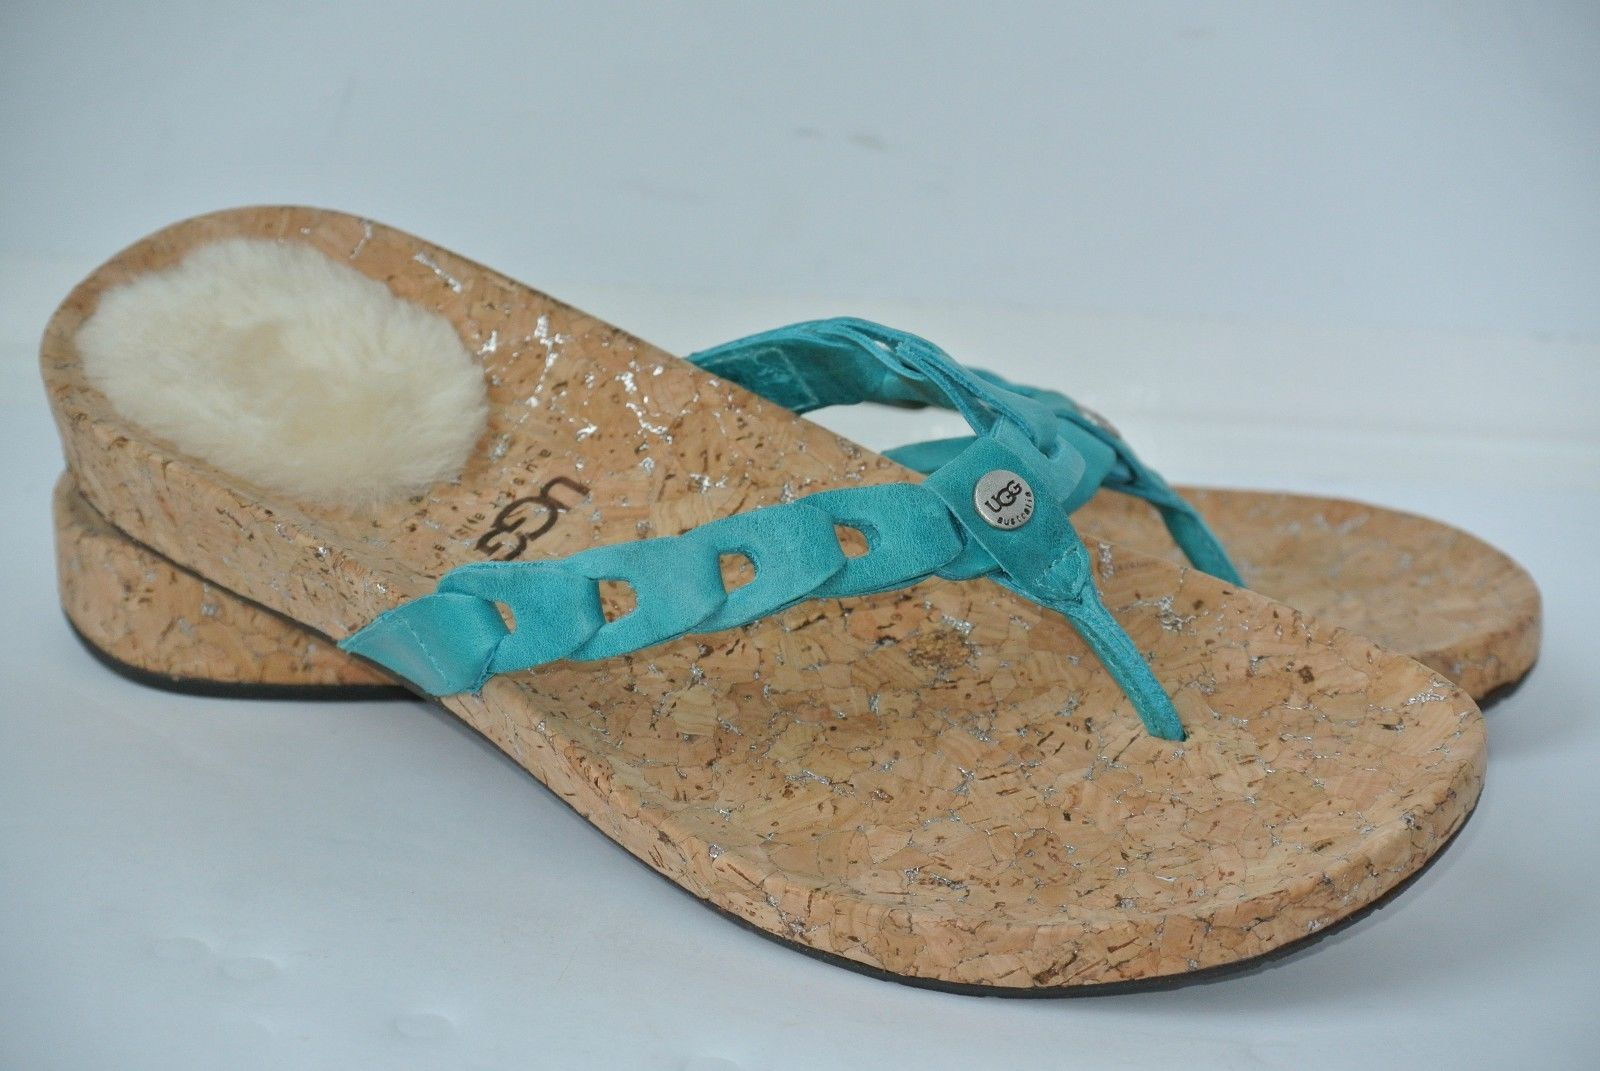 528c7174c0db Ugg Australia Womens Sz 8 Aqua Blue Leather and 50 similar items